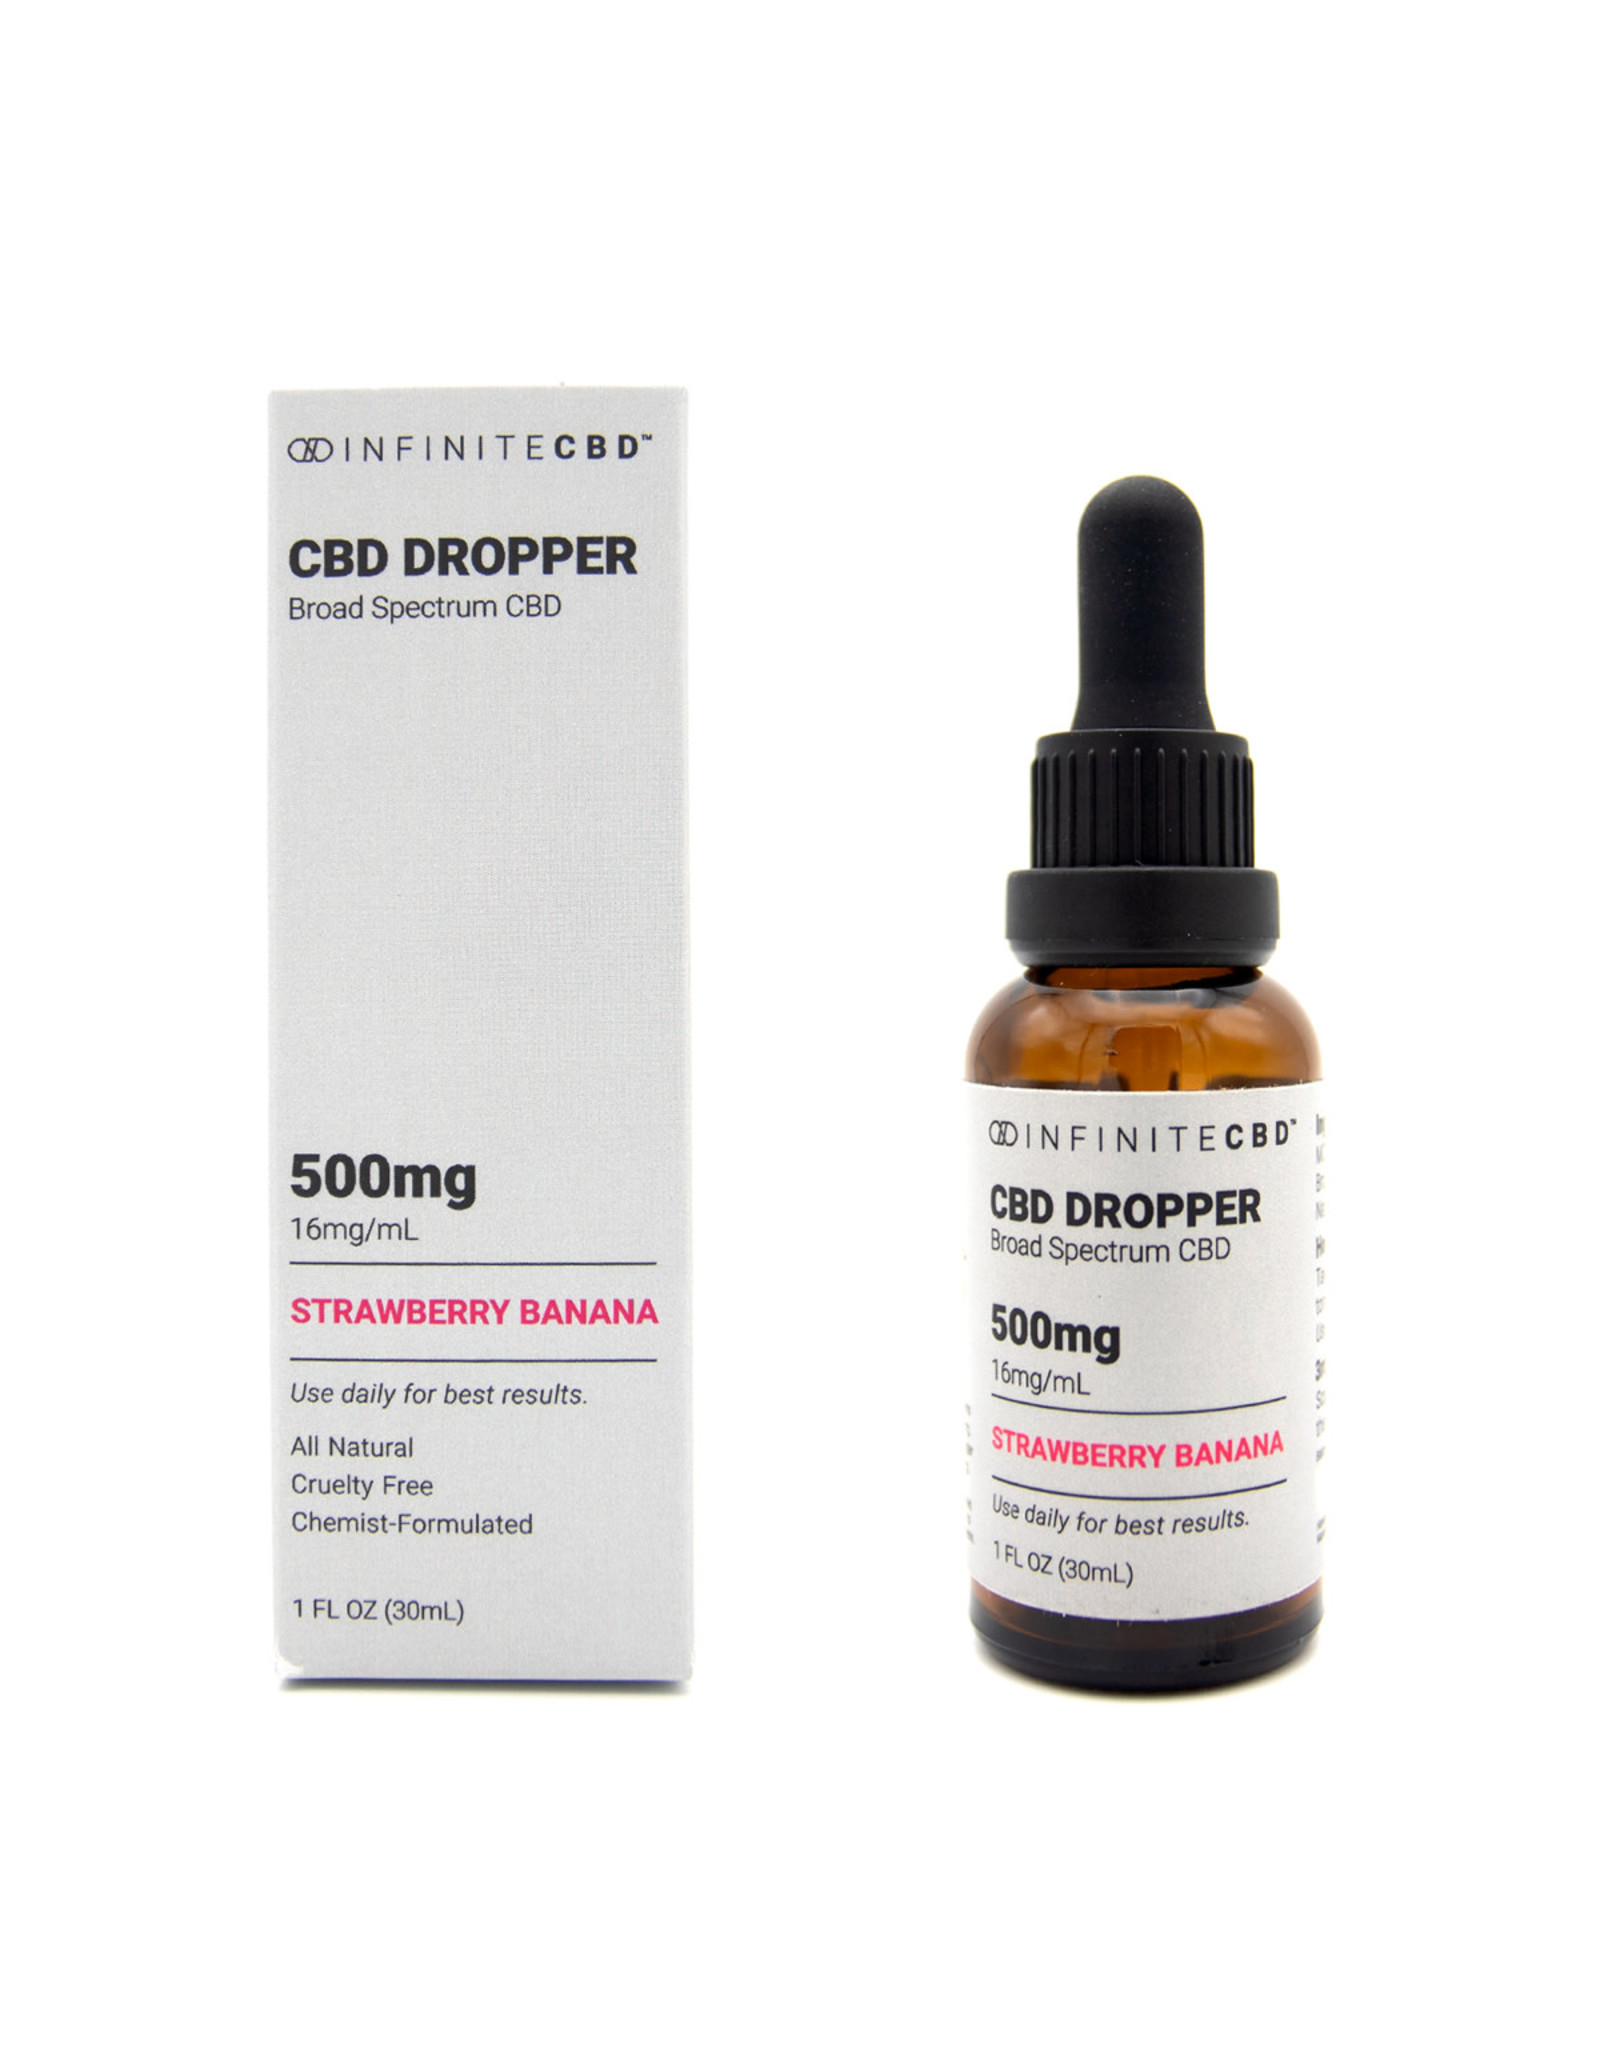 Infinite CBD Infinite CBD 500mg Broad Spectrum Dropper Tincture